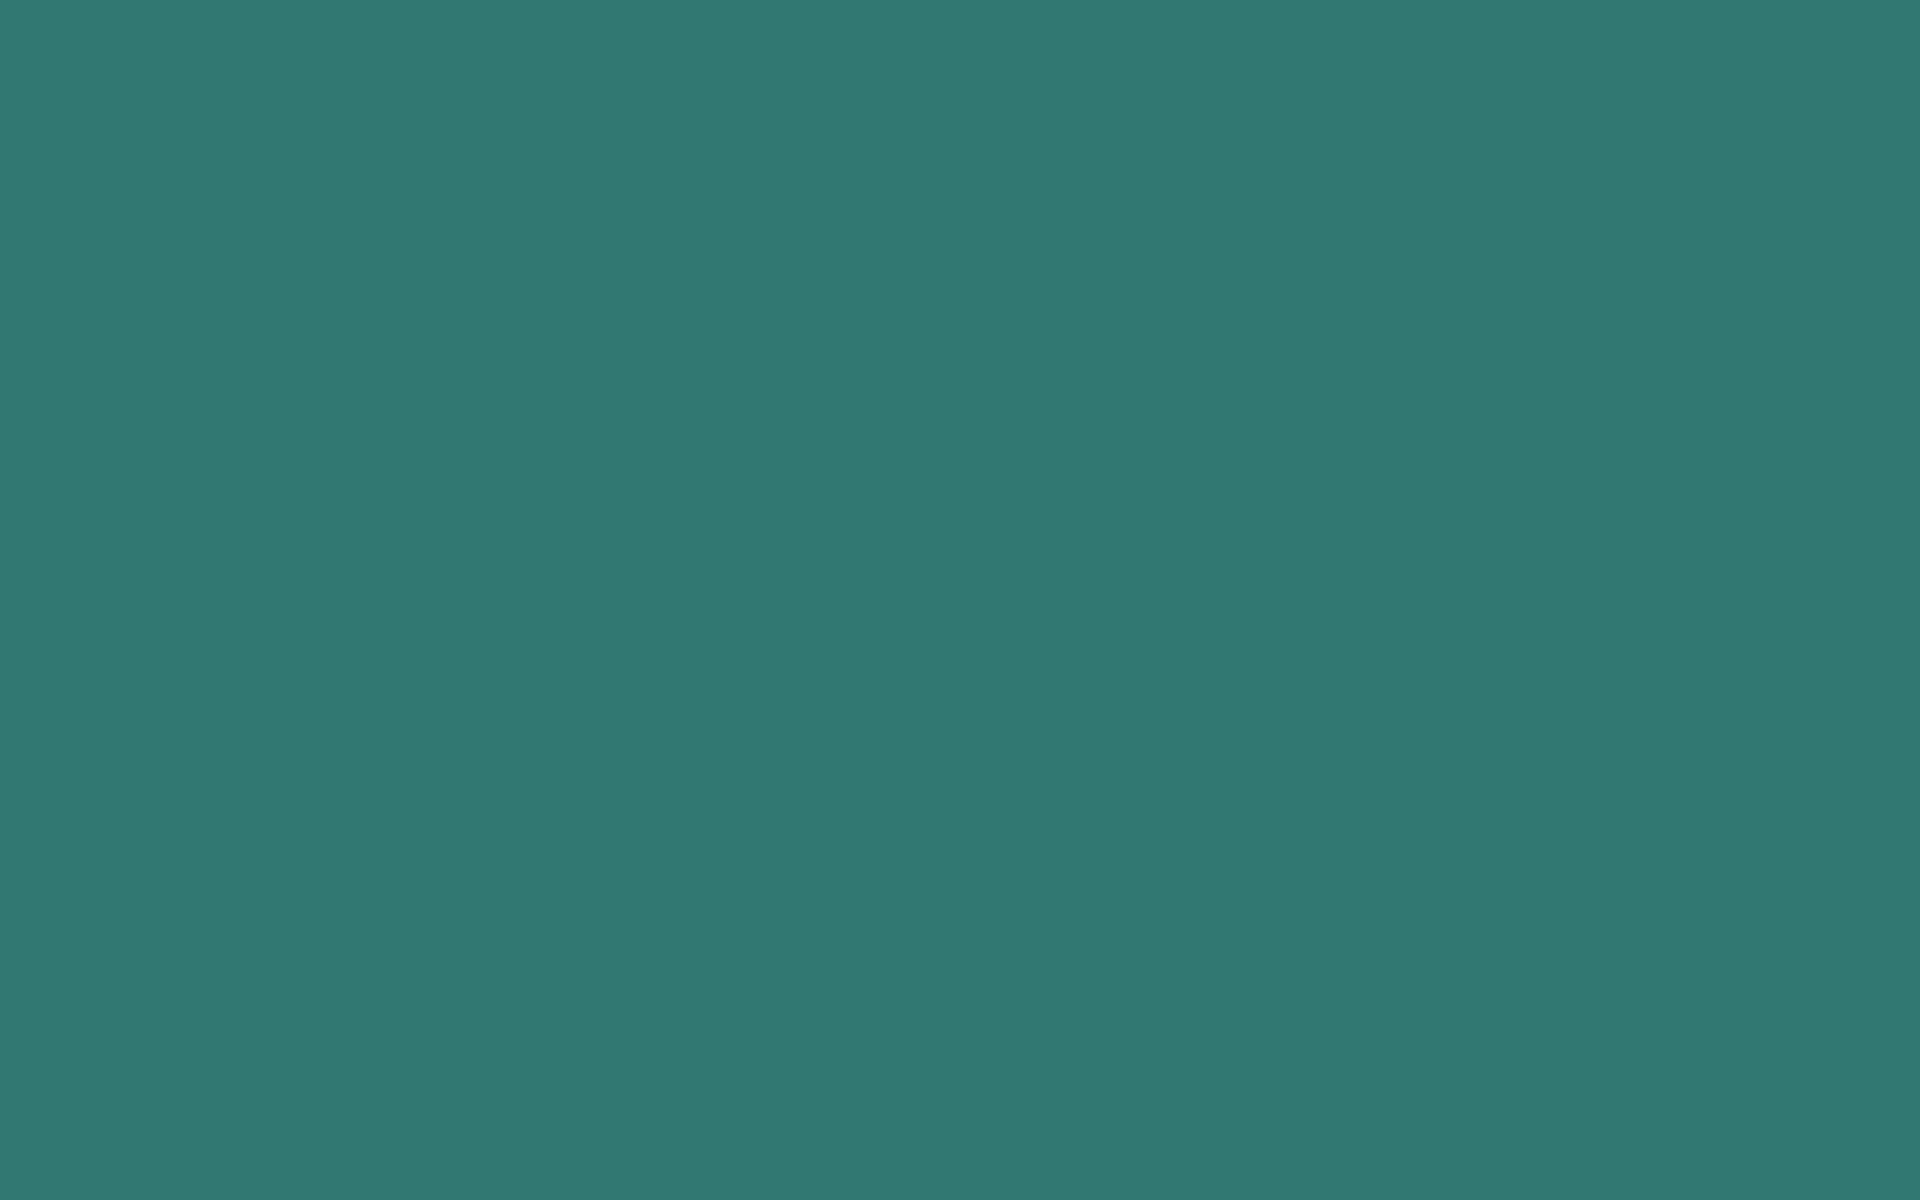 1920x1200 Myrtle Green Solid Color Background